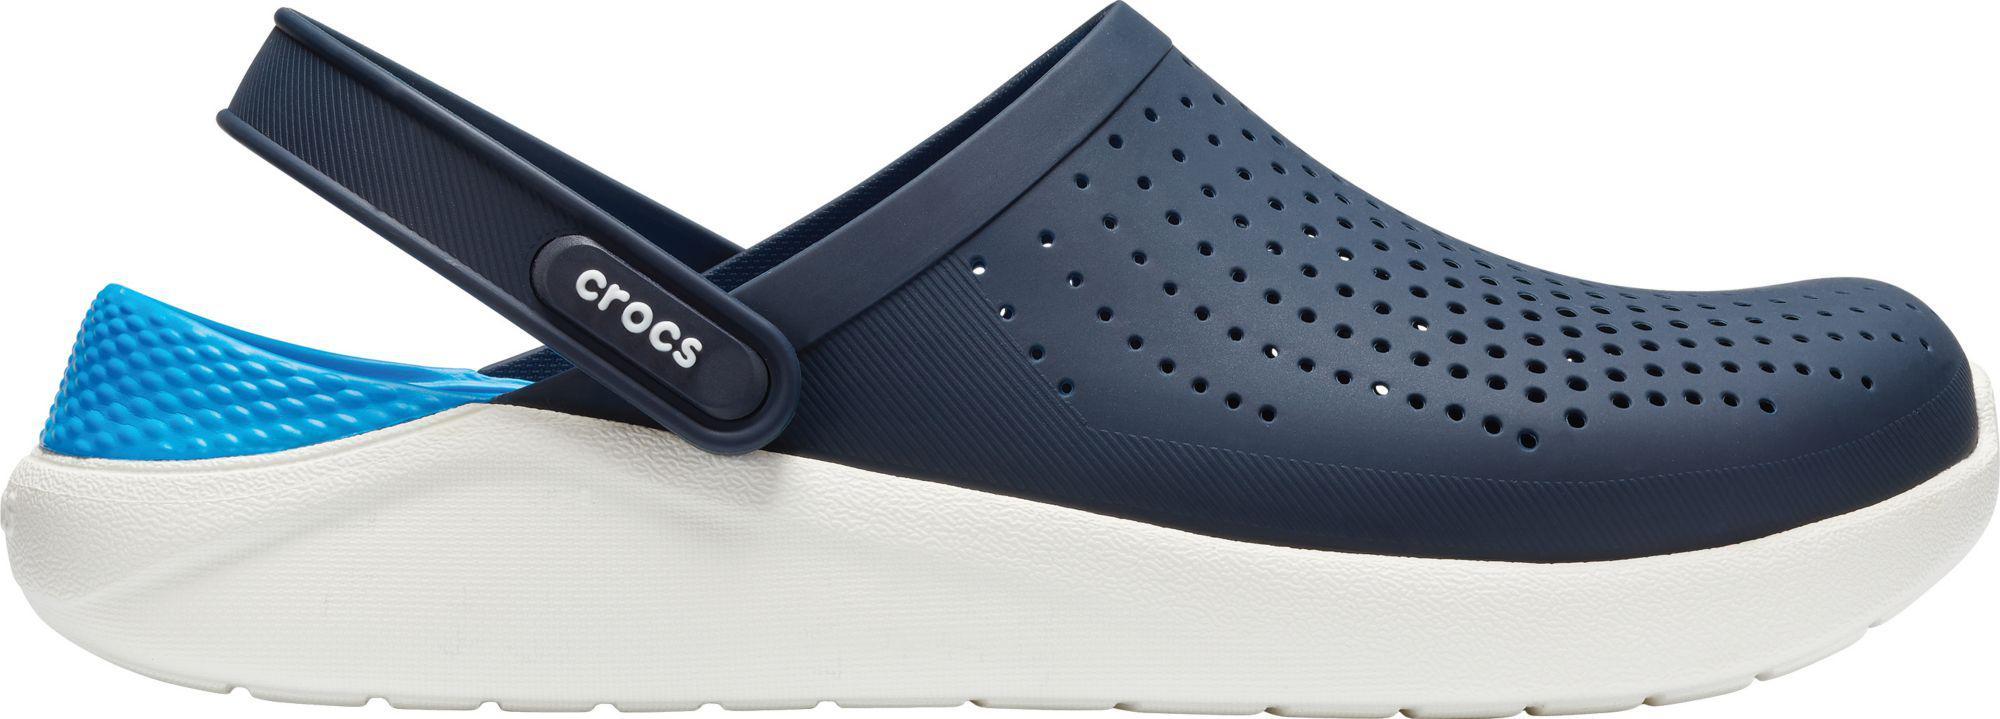 98b2e246b146 Lyst - Crocs™ Adult Literide Clogs in Blue